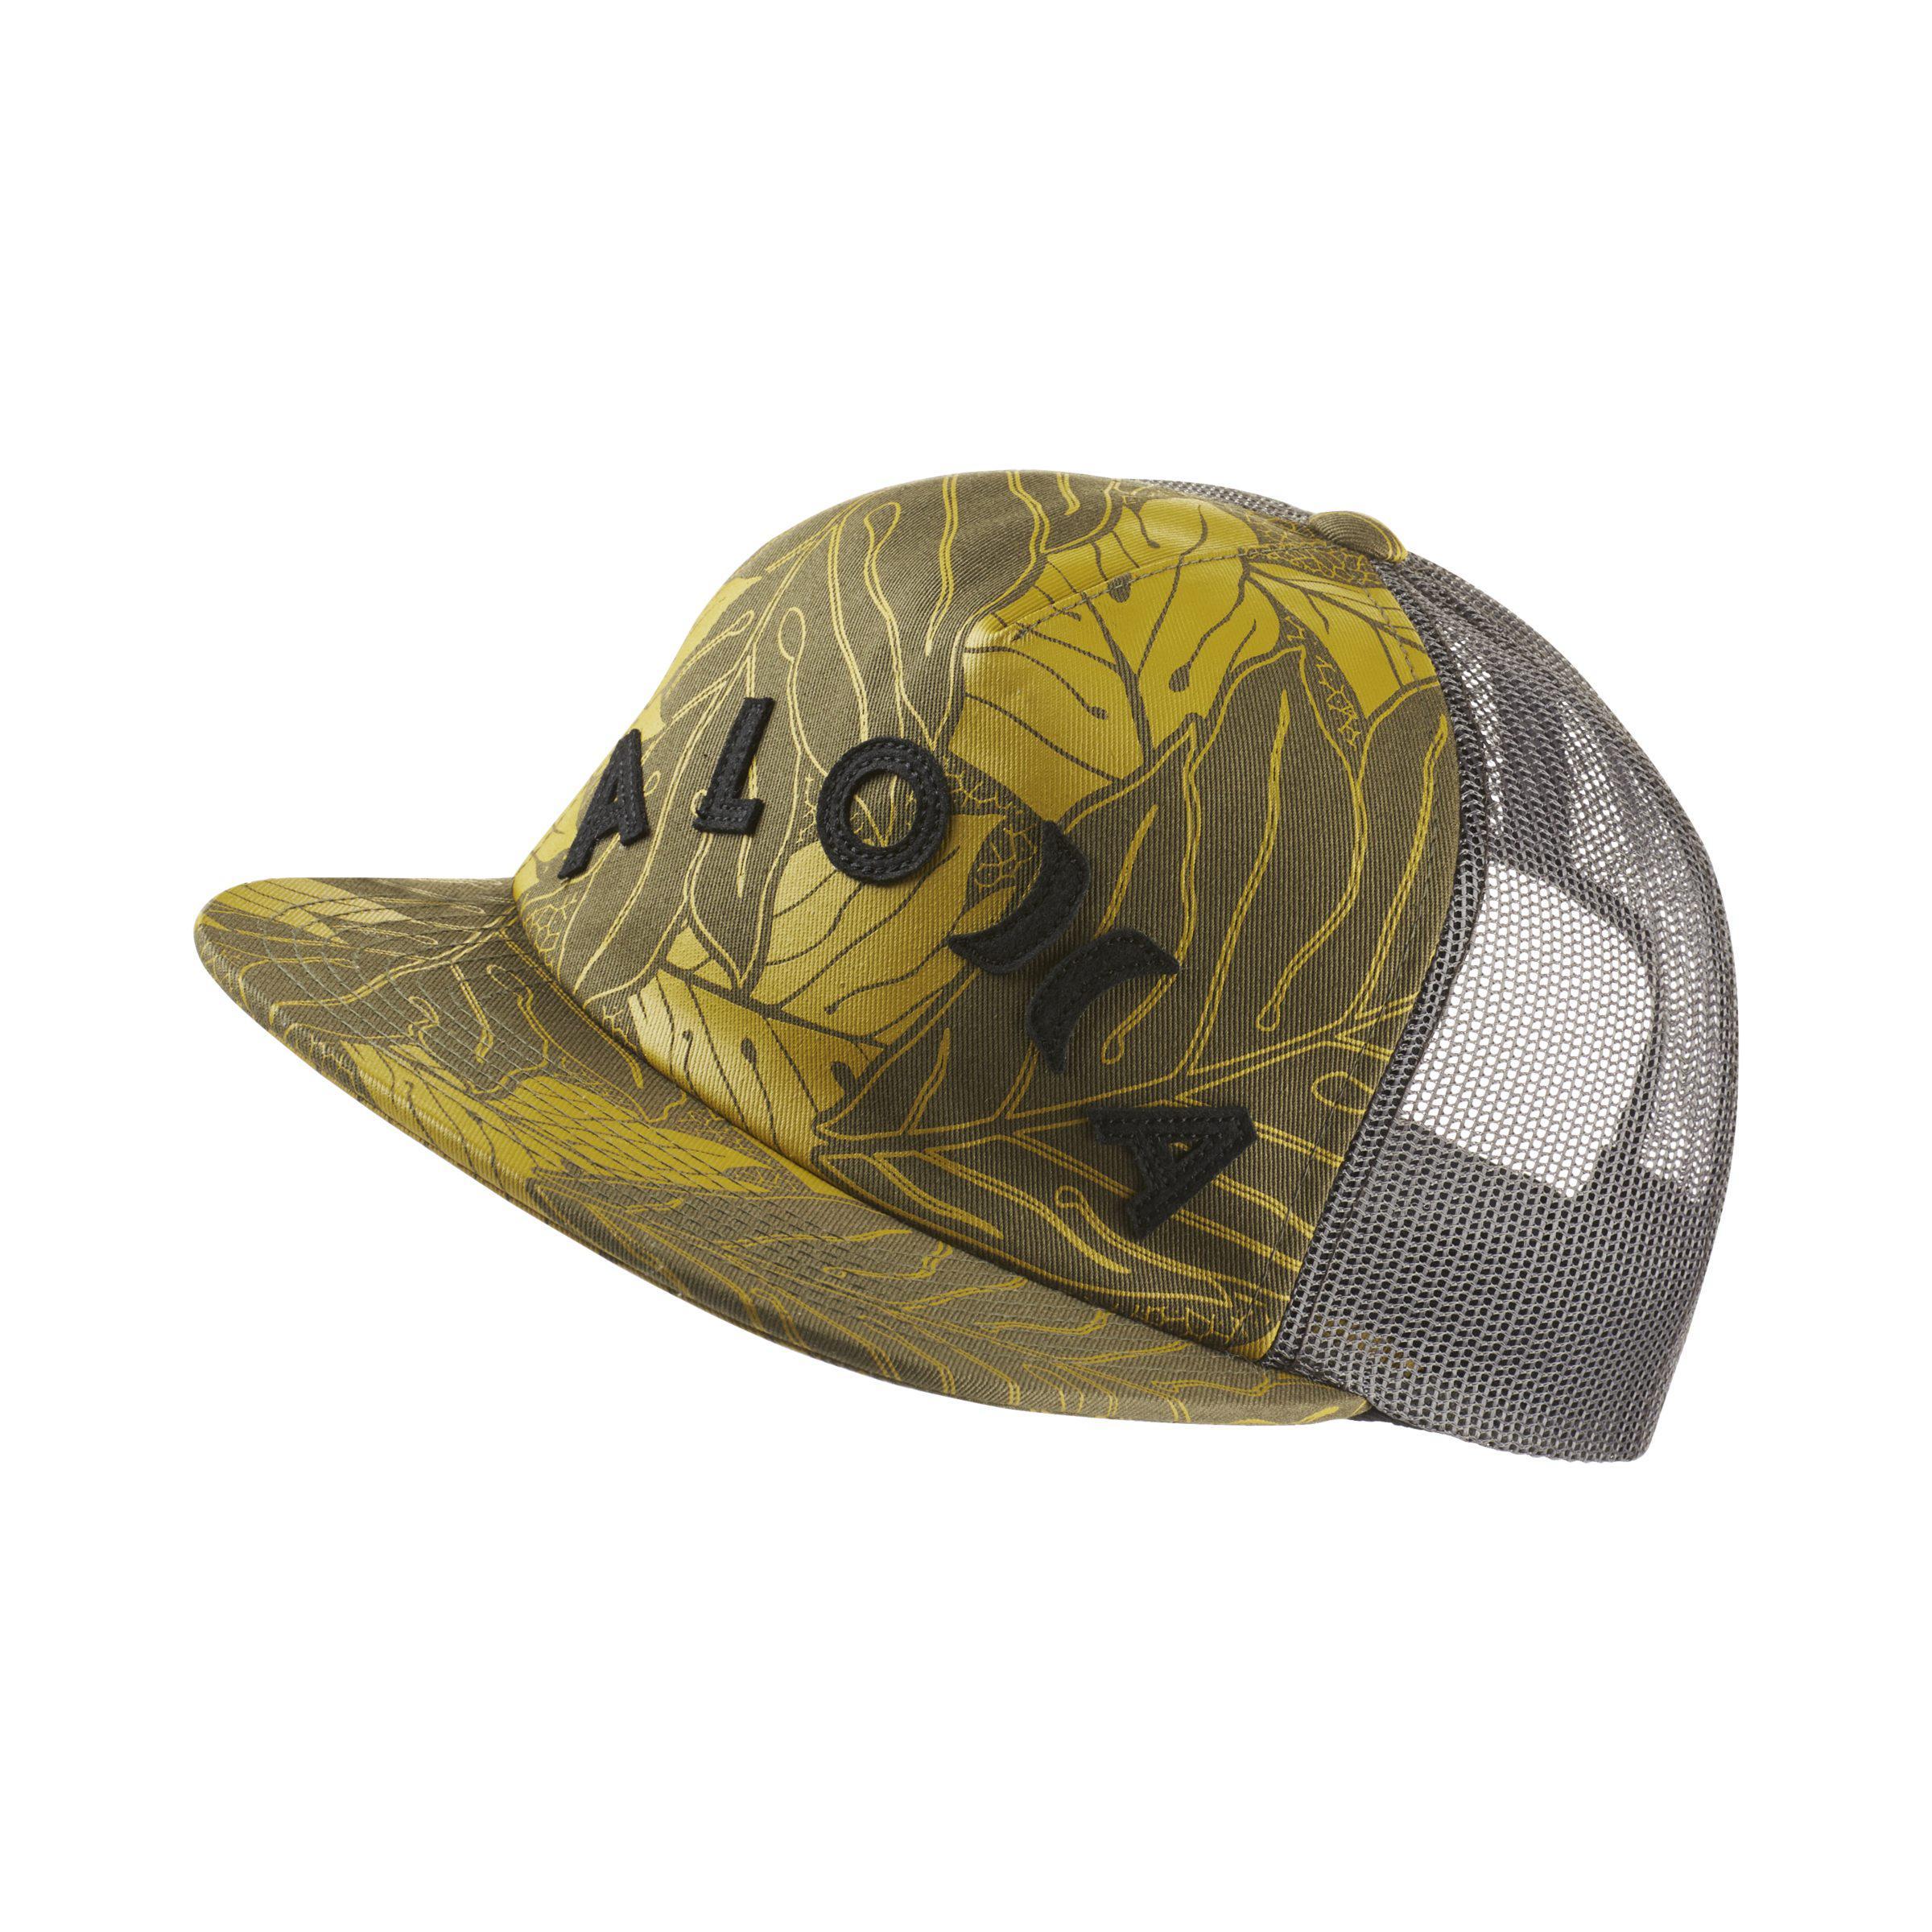 930a025137638 Nike Hurley Sig Zane Ululoa Hat in Green for Men - Lyst